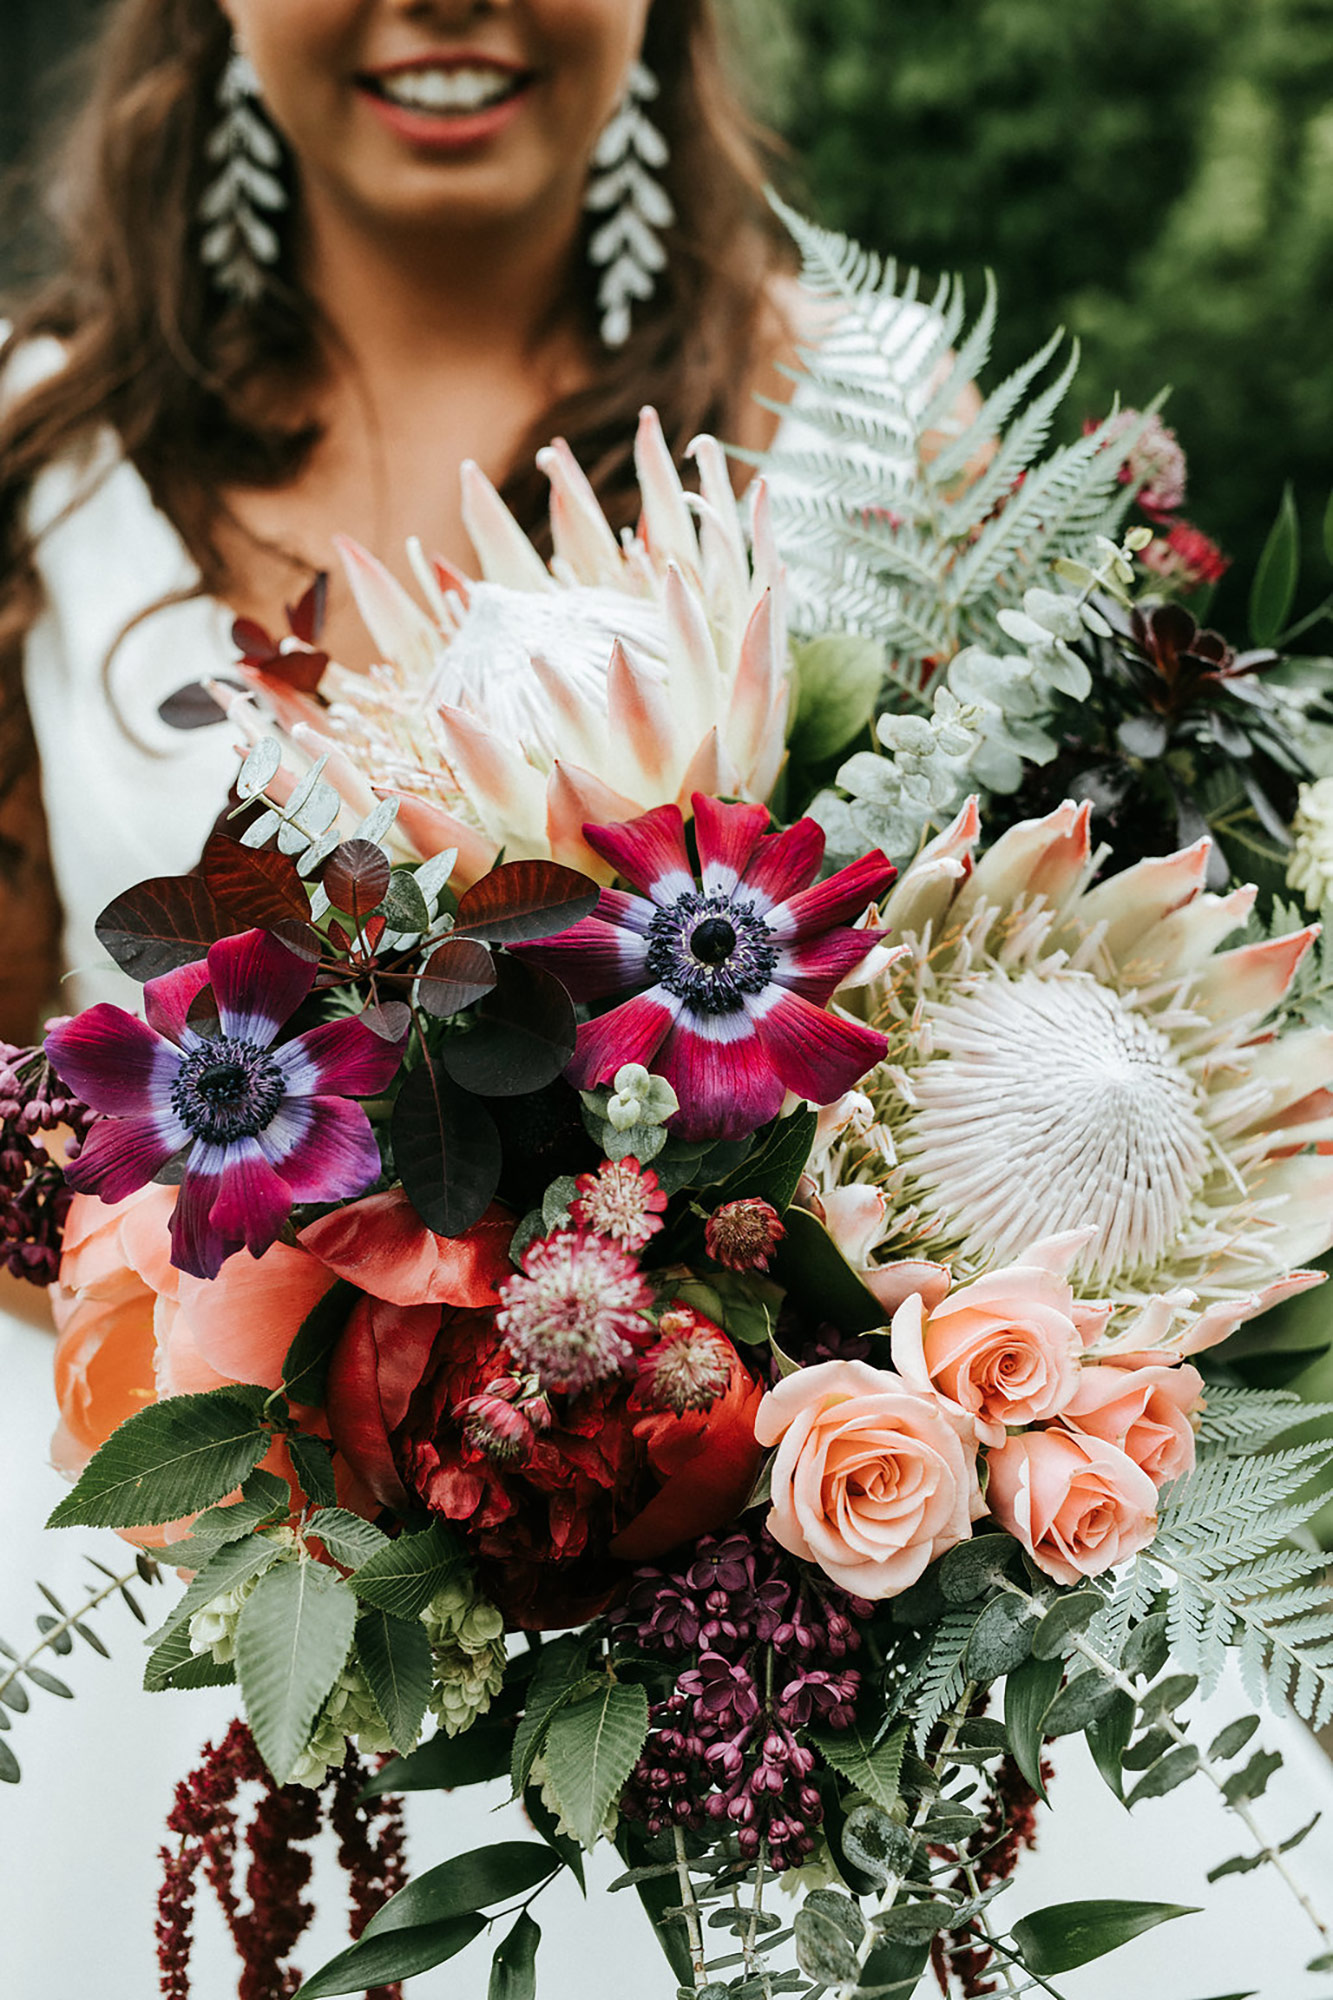 Kurtz-Orchards-Wedding-Niagara-wedding-Vineyard-Bride-Photography-by-Kayla-Rocca-005.JPG